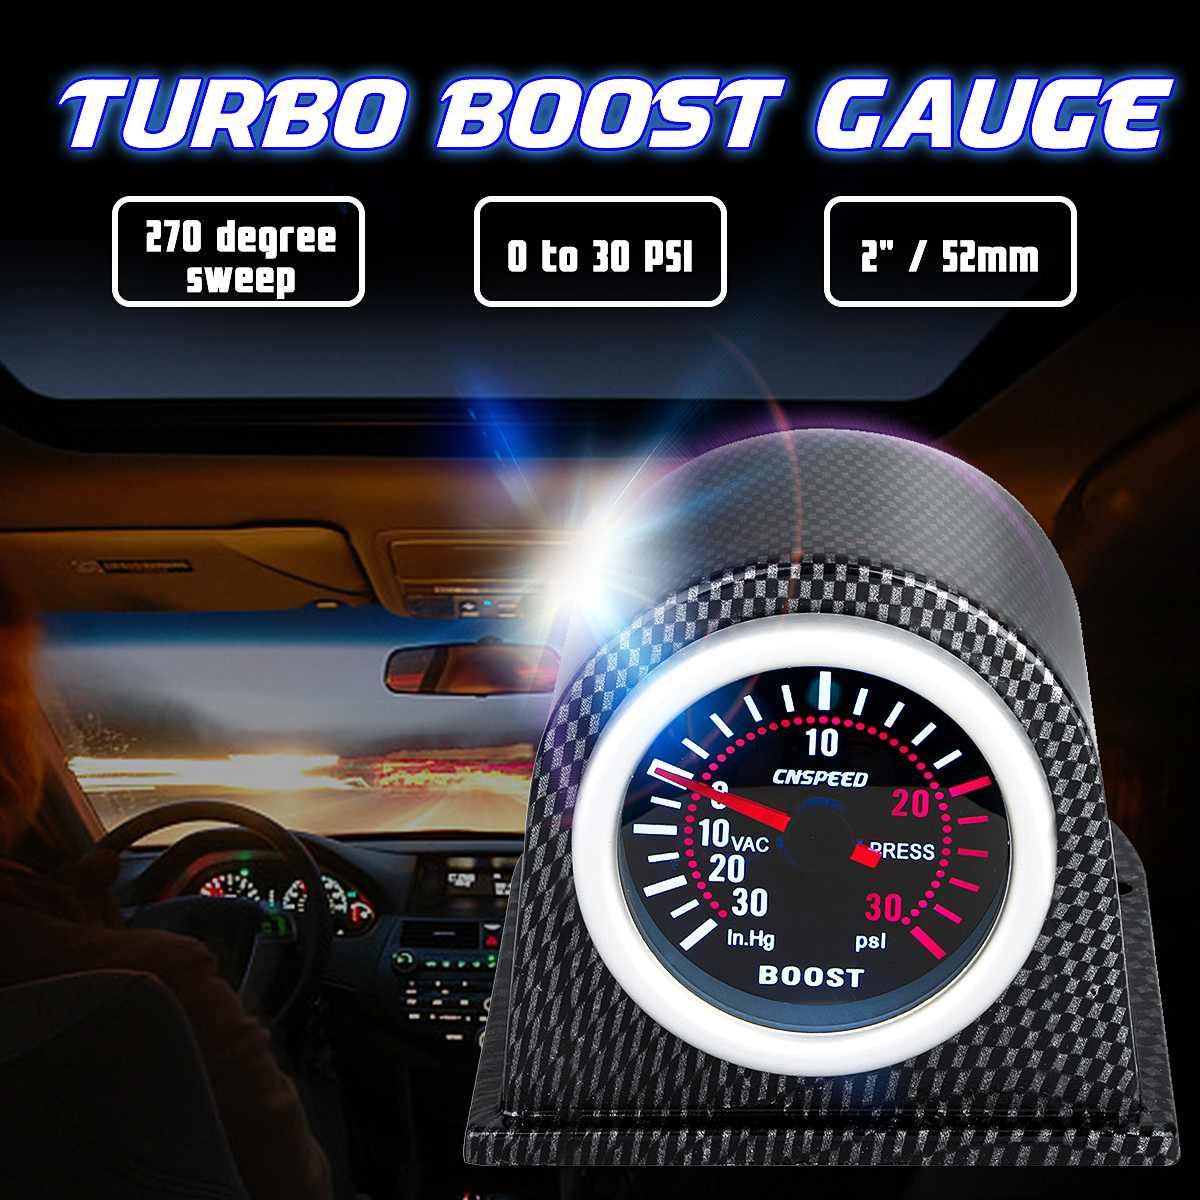 Car Gauge Boost Set Smoke Meter Auto Turbo Bar 52mm Digital Durable New